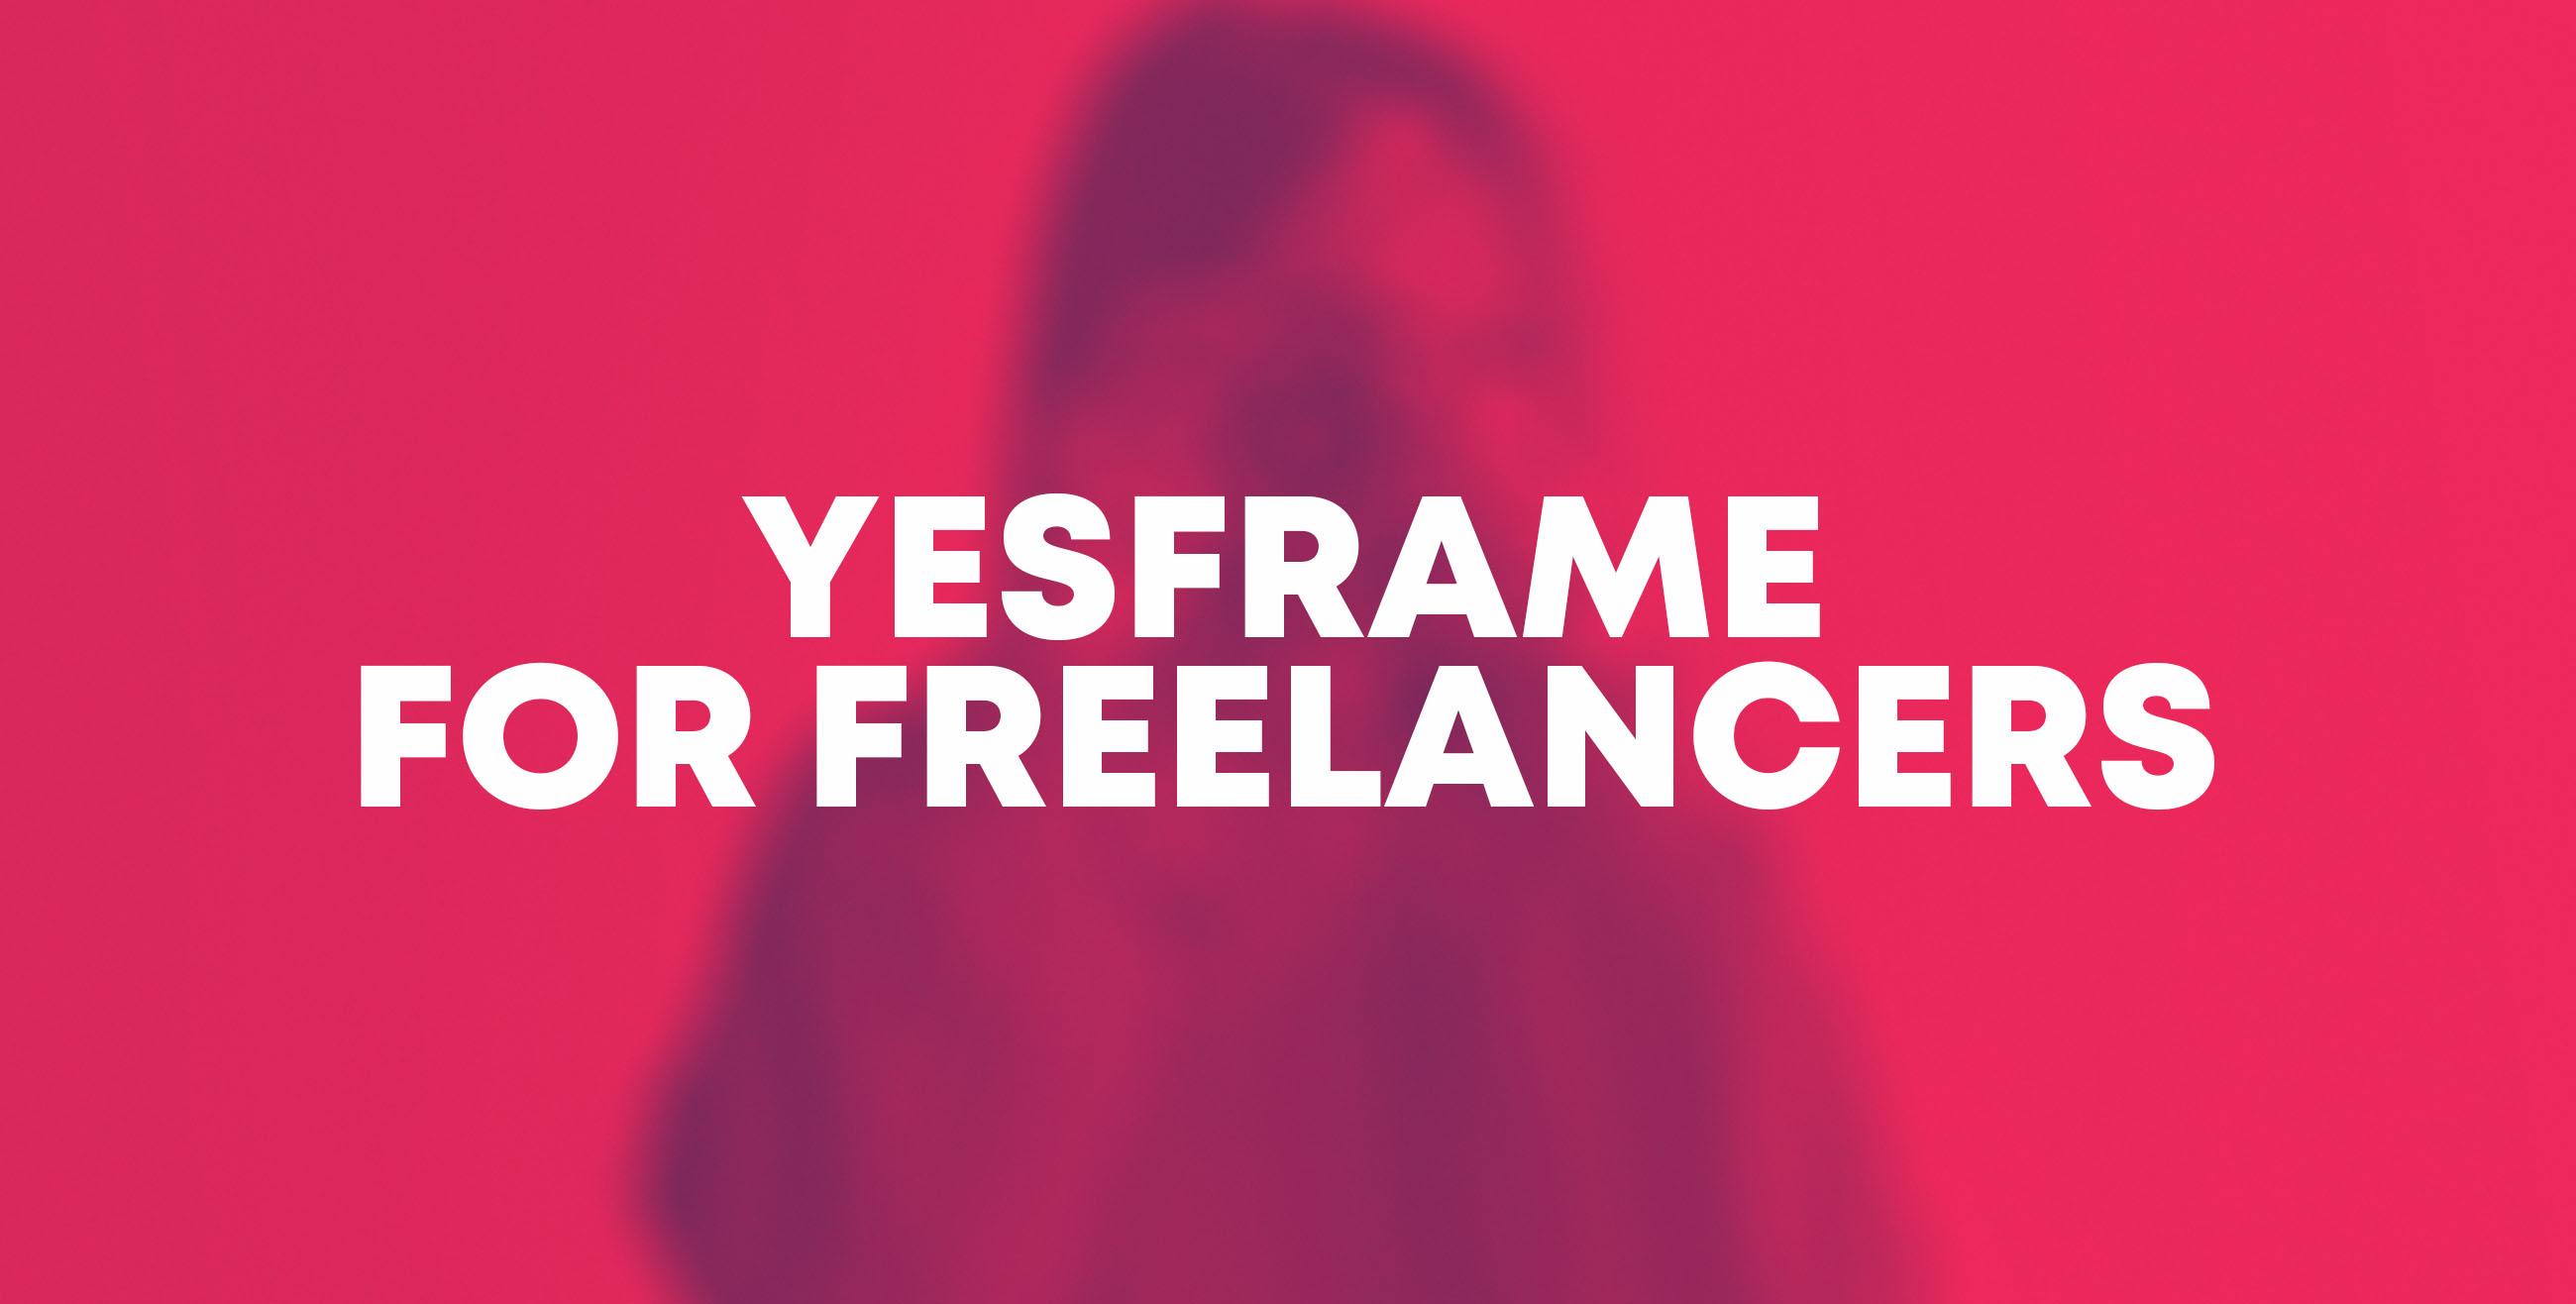 yesframe for freelancers blog 11